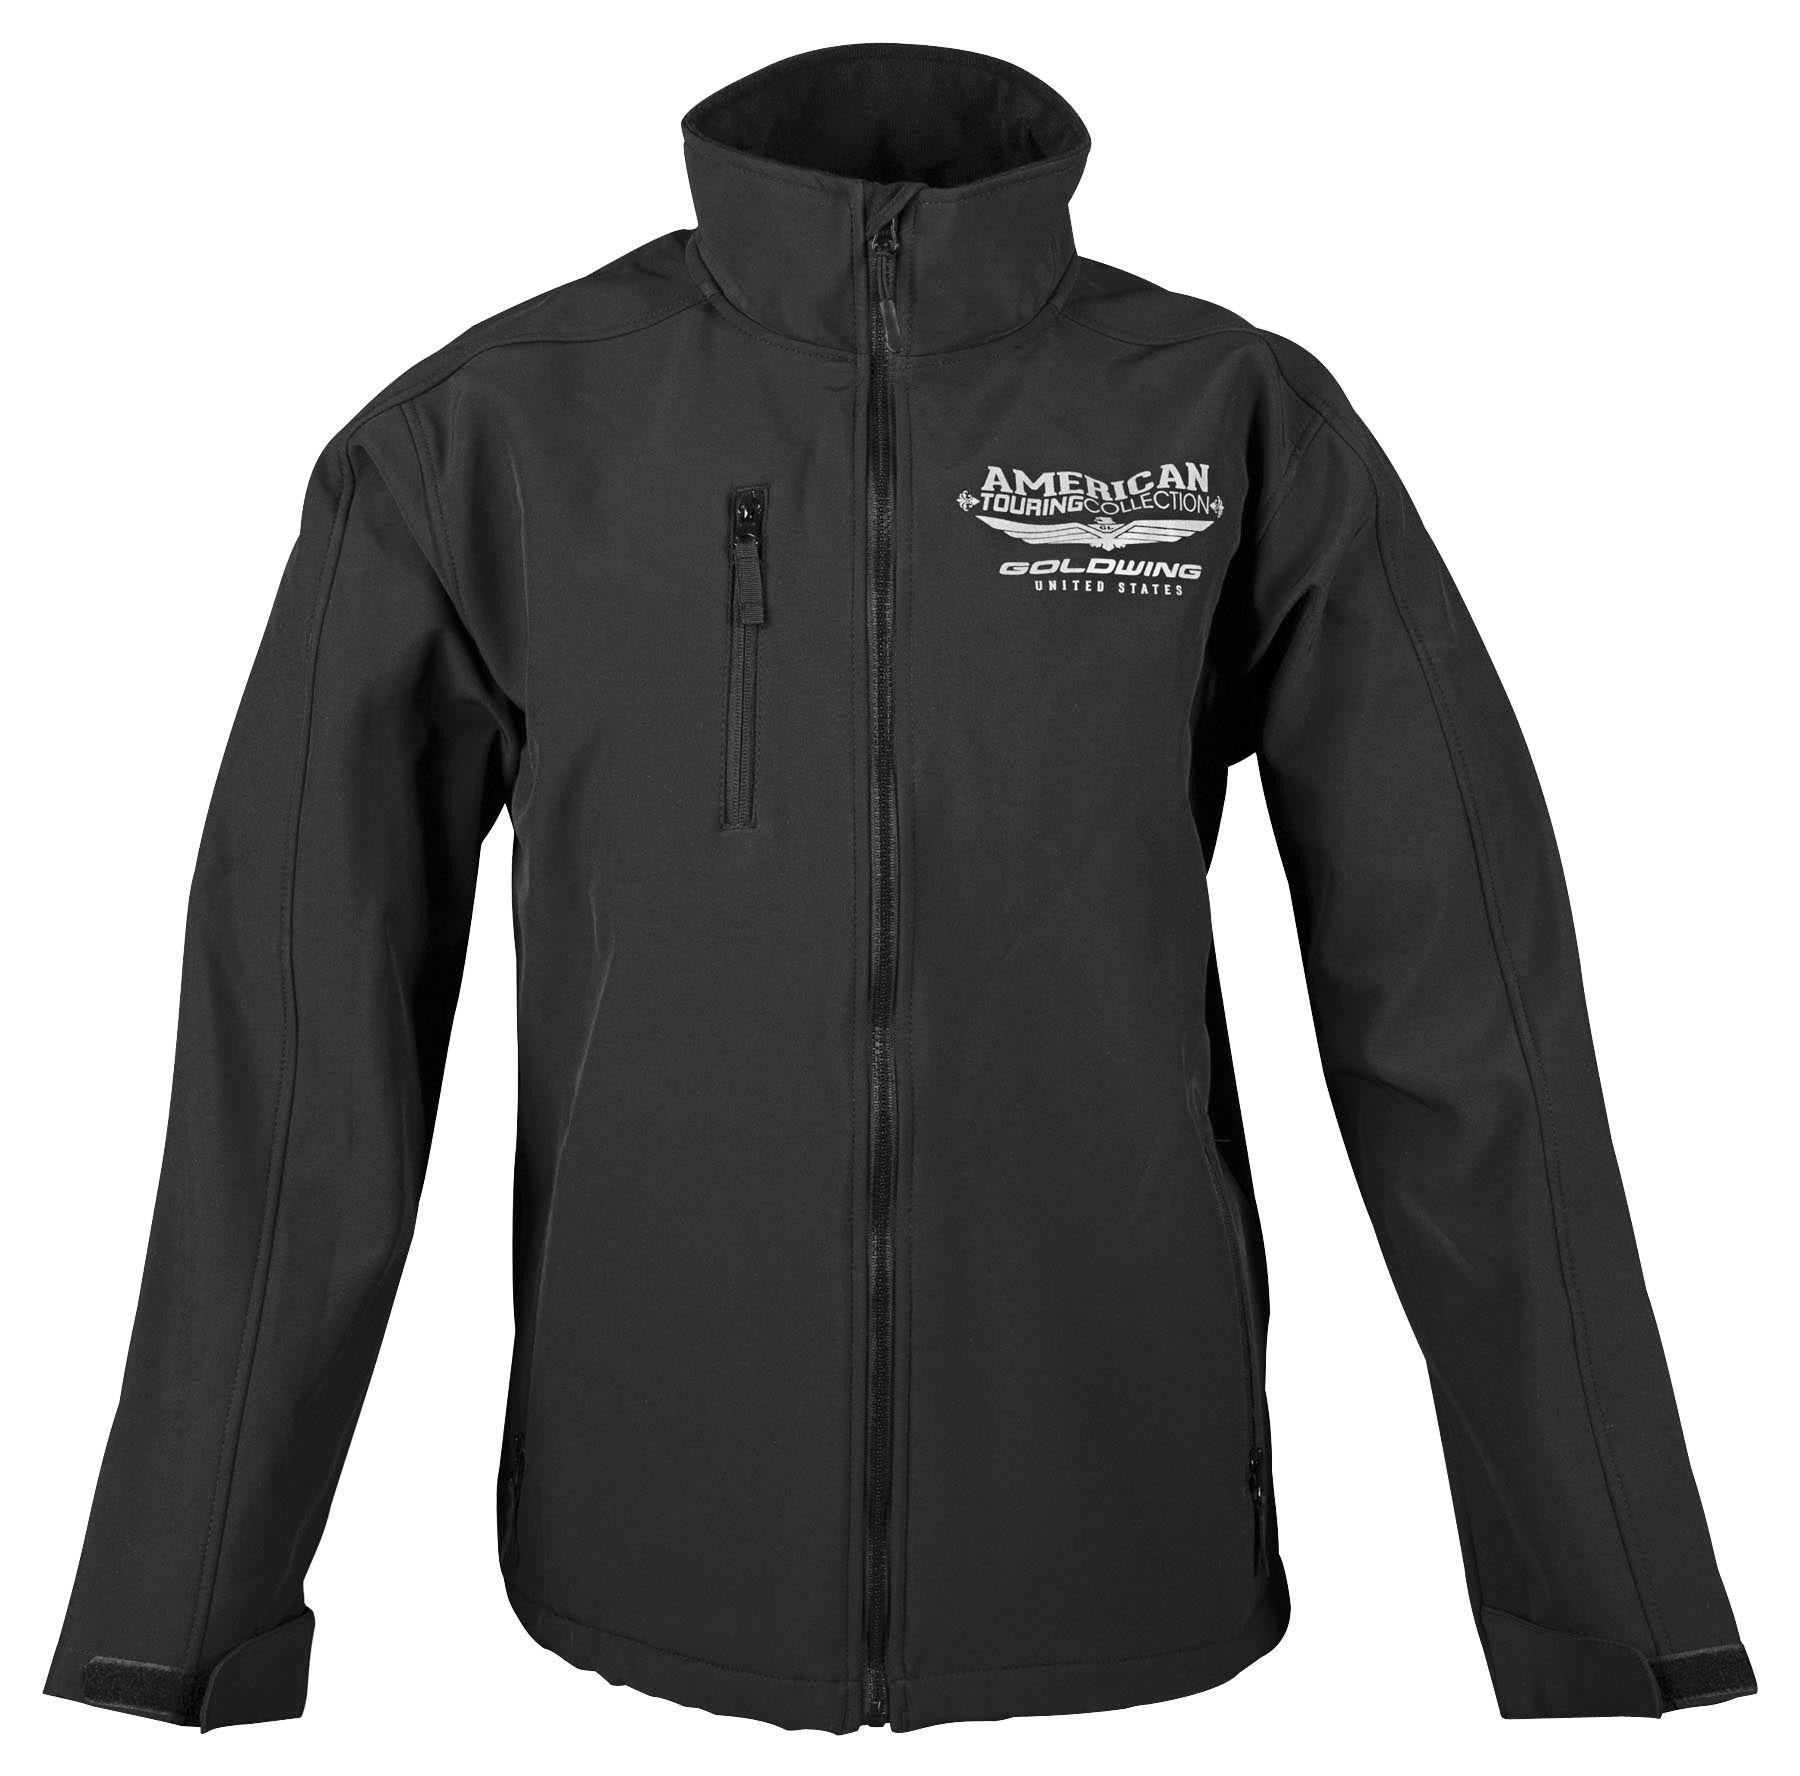 Honda Goldwing Touring Collection Jacket 10 10 00